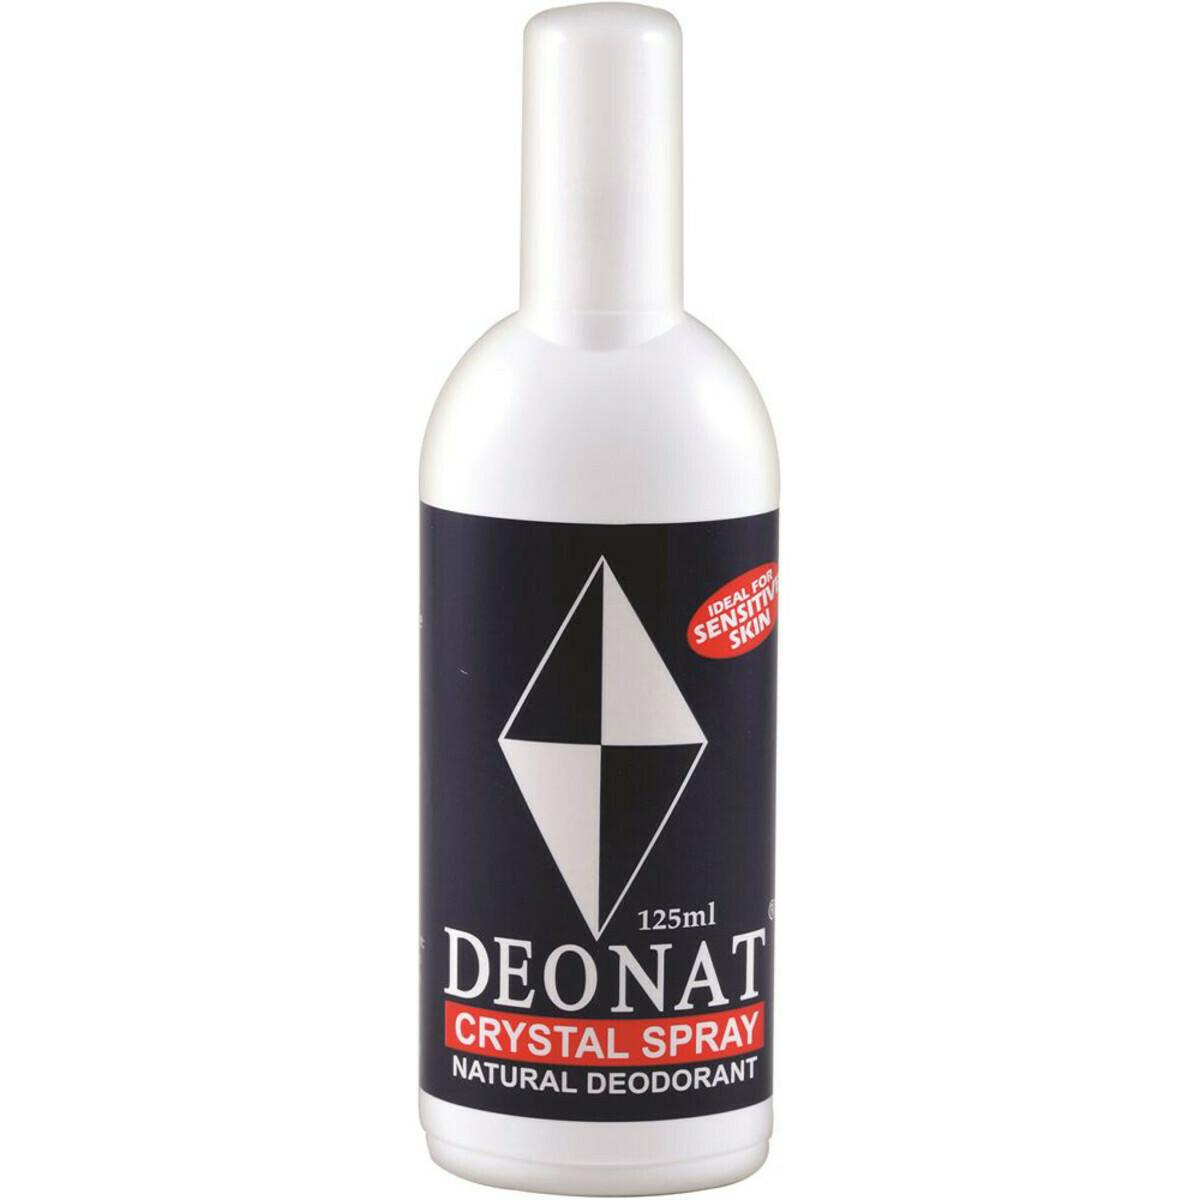 Deonat Crystal Deodorant Spray